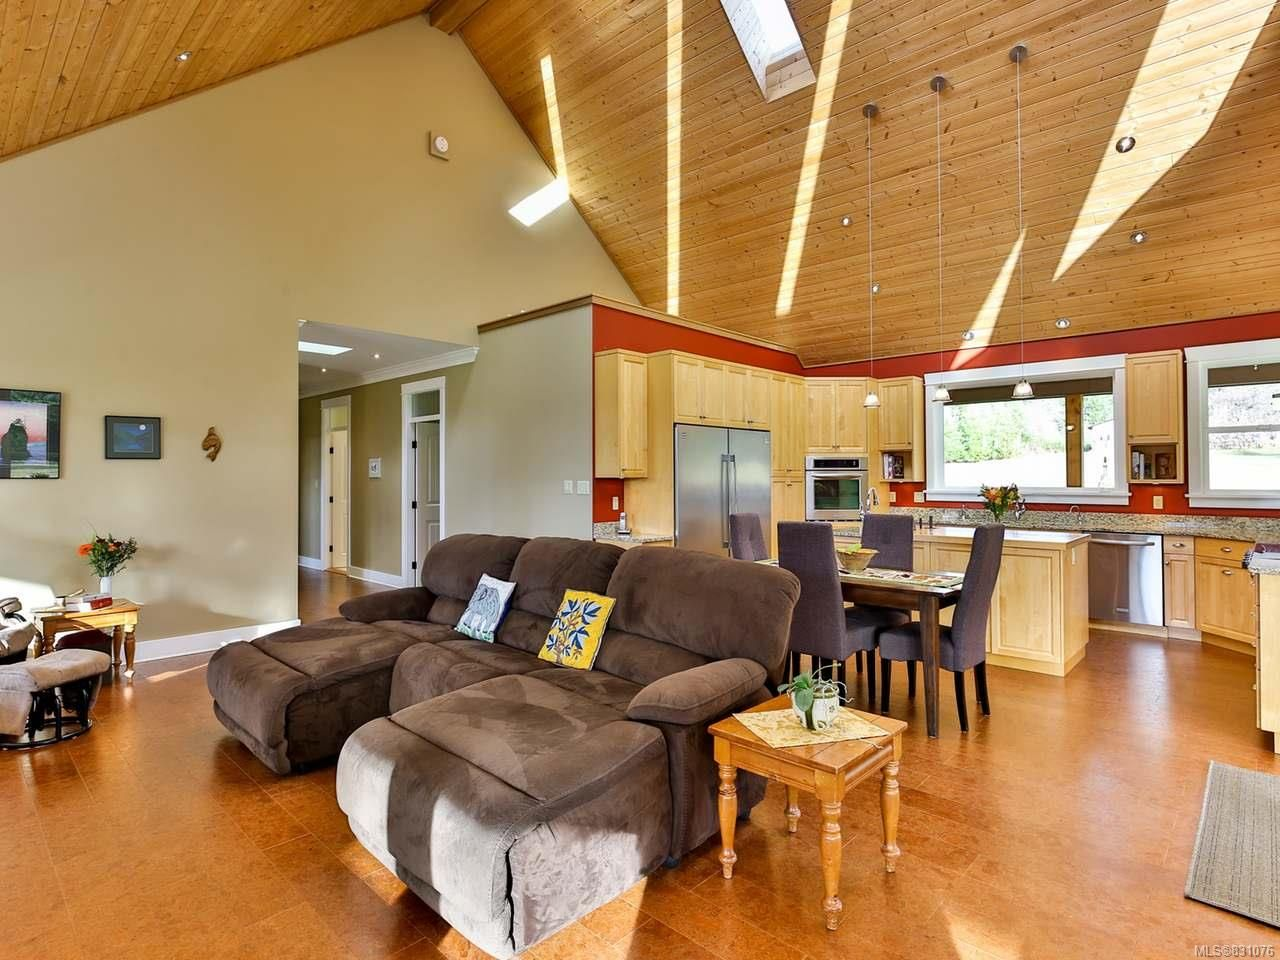 Photo 6: Photos: 6159 Strathcona St in PORT ALBERNI: PA Alberni Valley House for sale (Port Alberni)  : MLS®# 831076